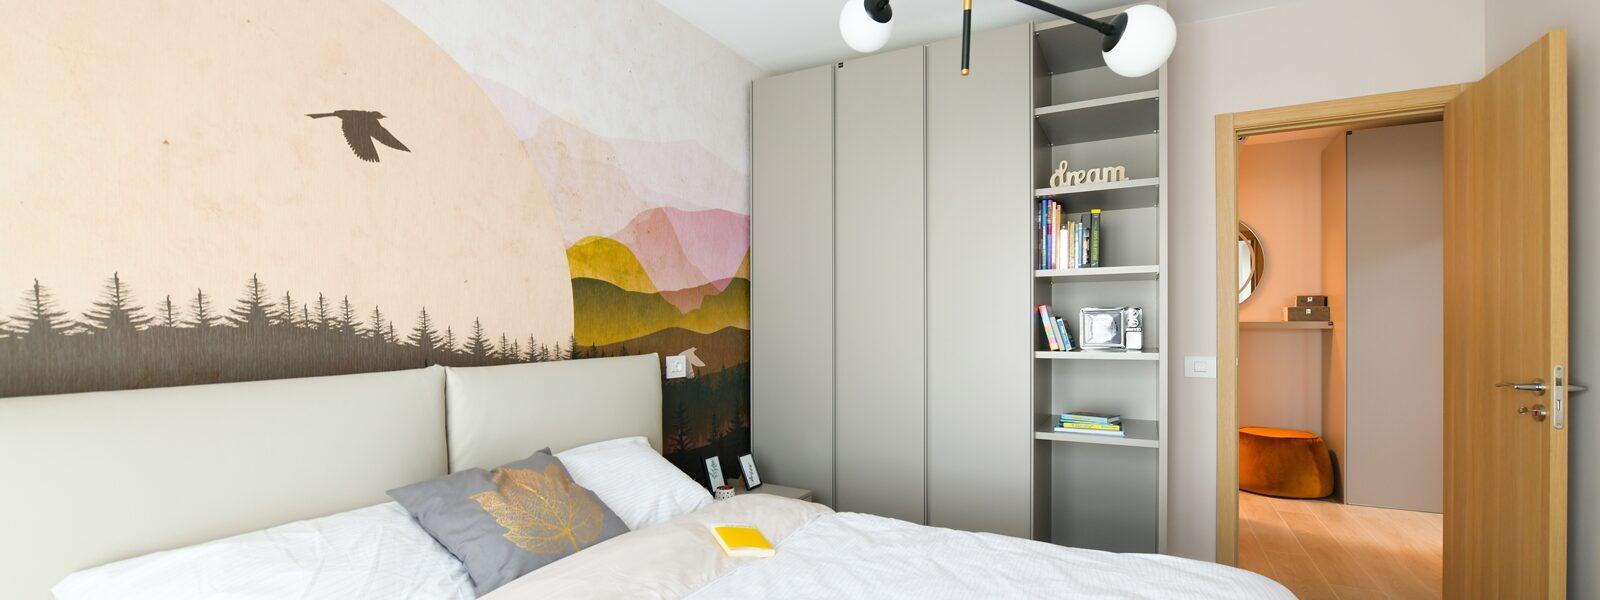 Apartamente Rovere (Tip 12)